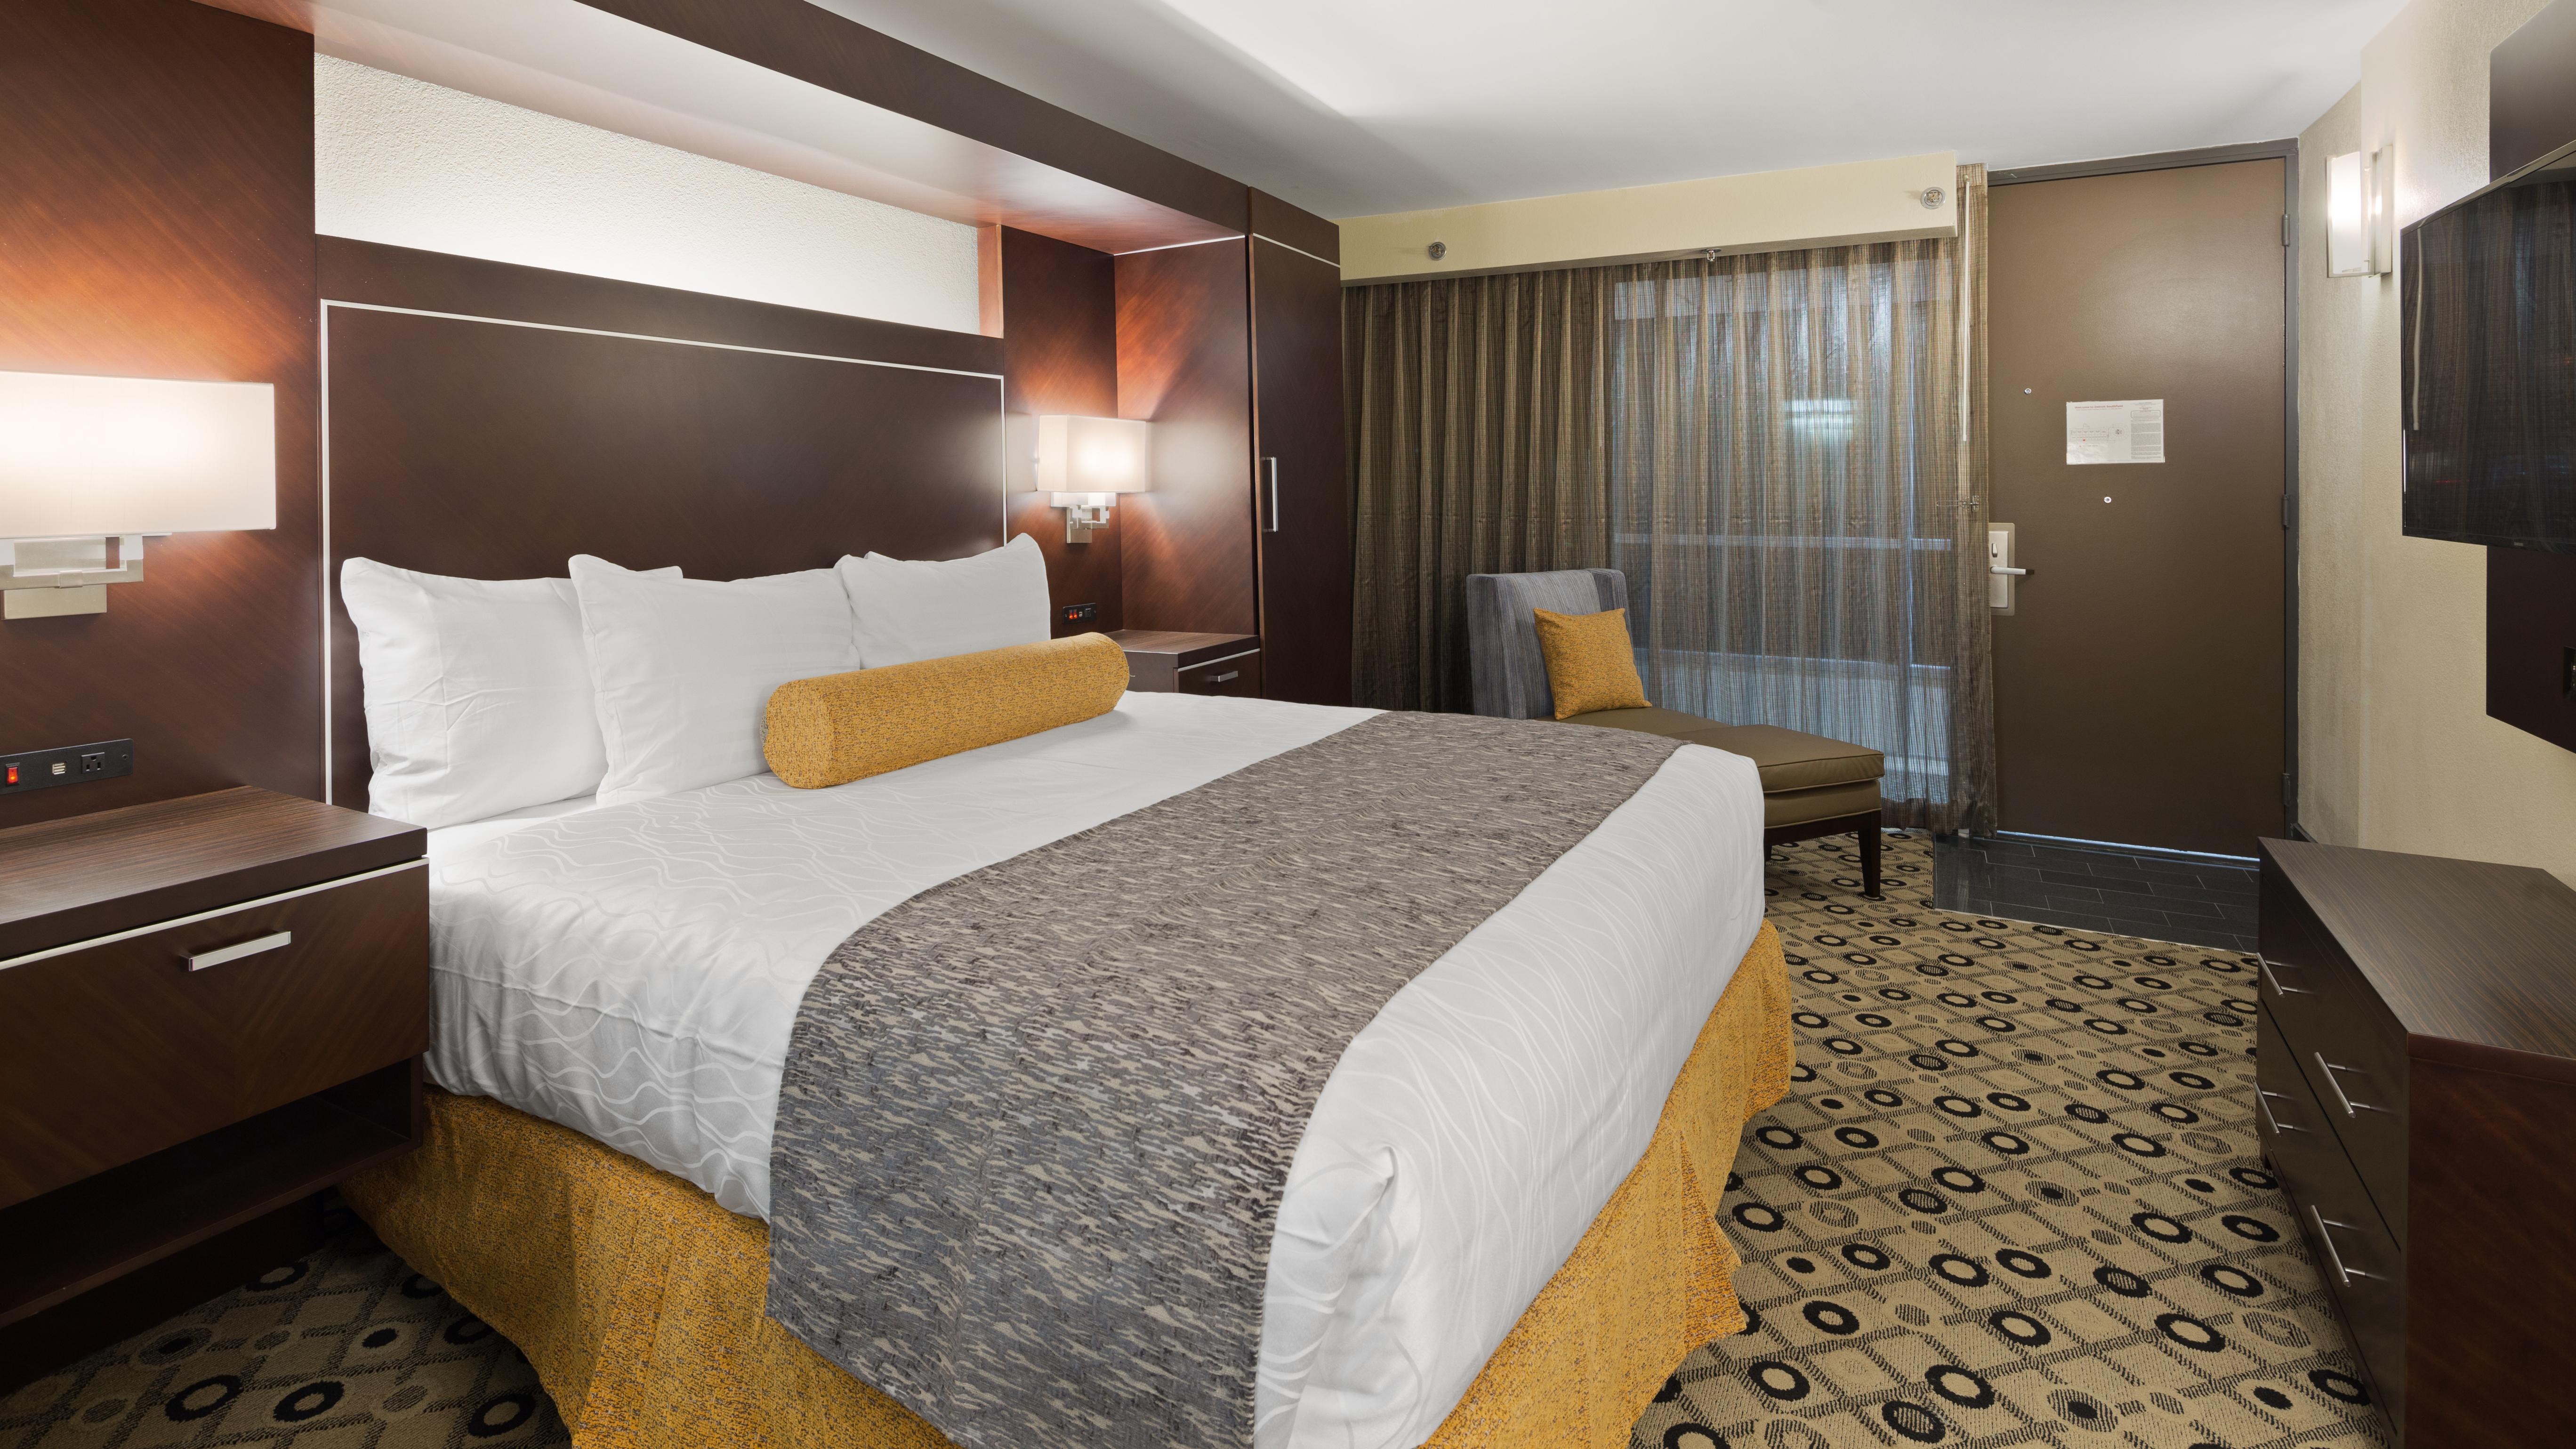 Hotel Rooms Amp Suites In Southfield Mi Best Western Premier